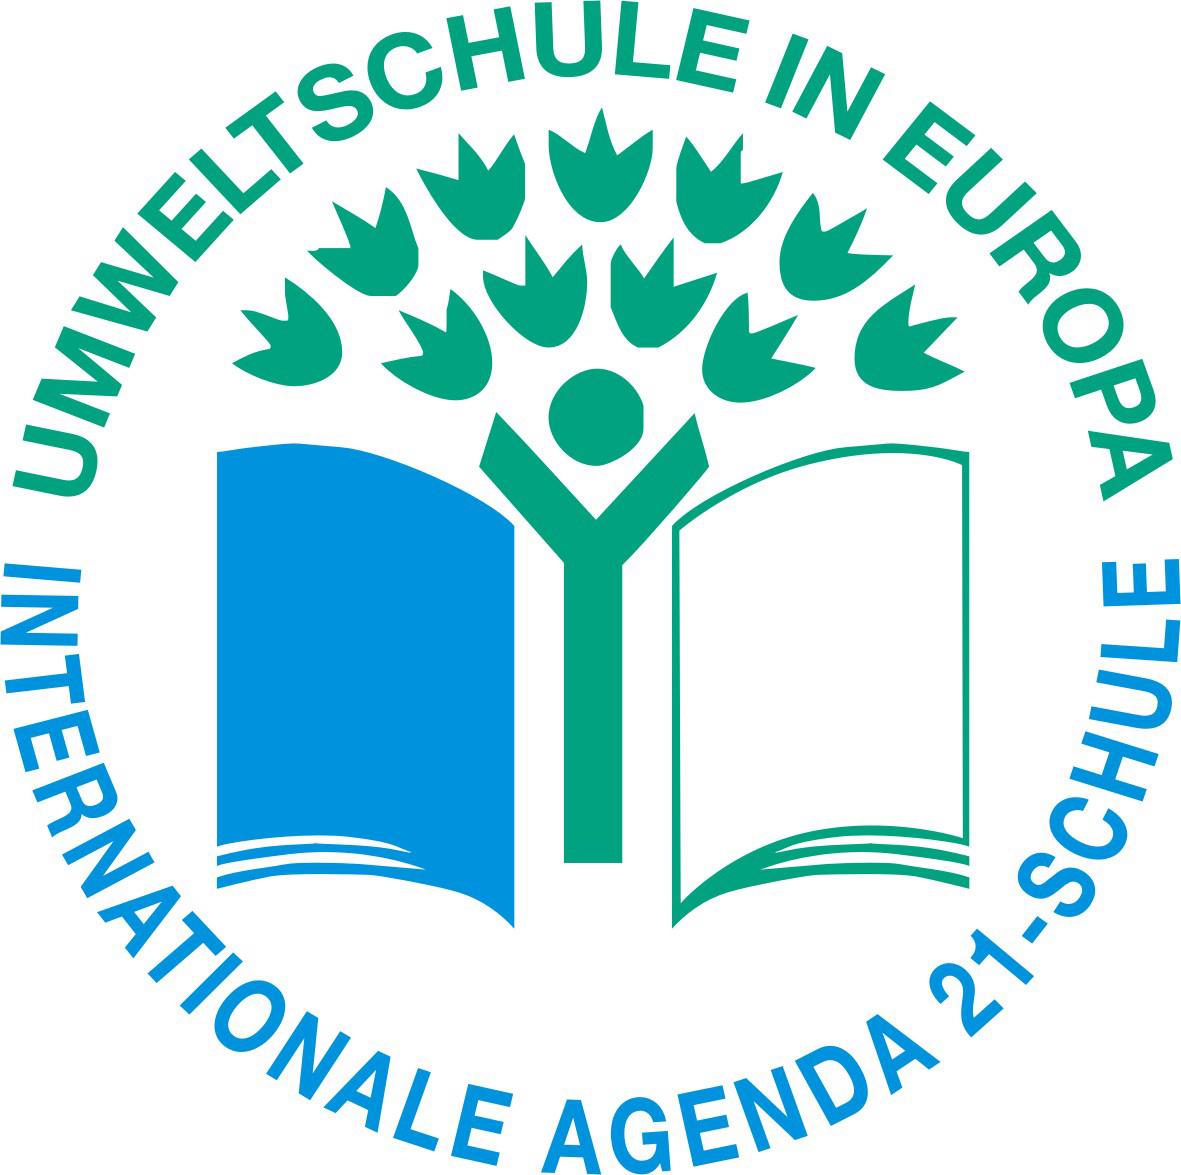 logo_agenda21schule